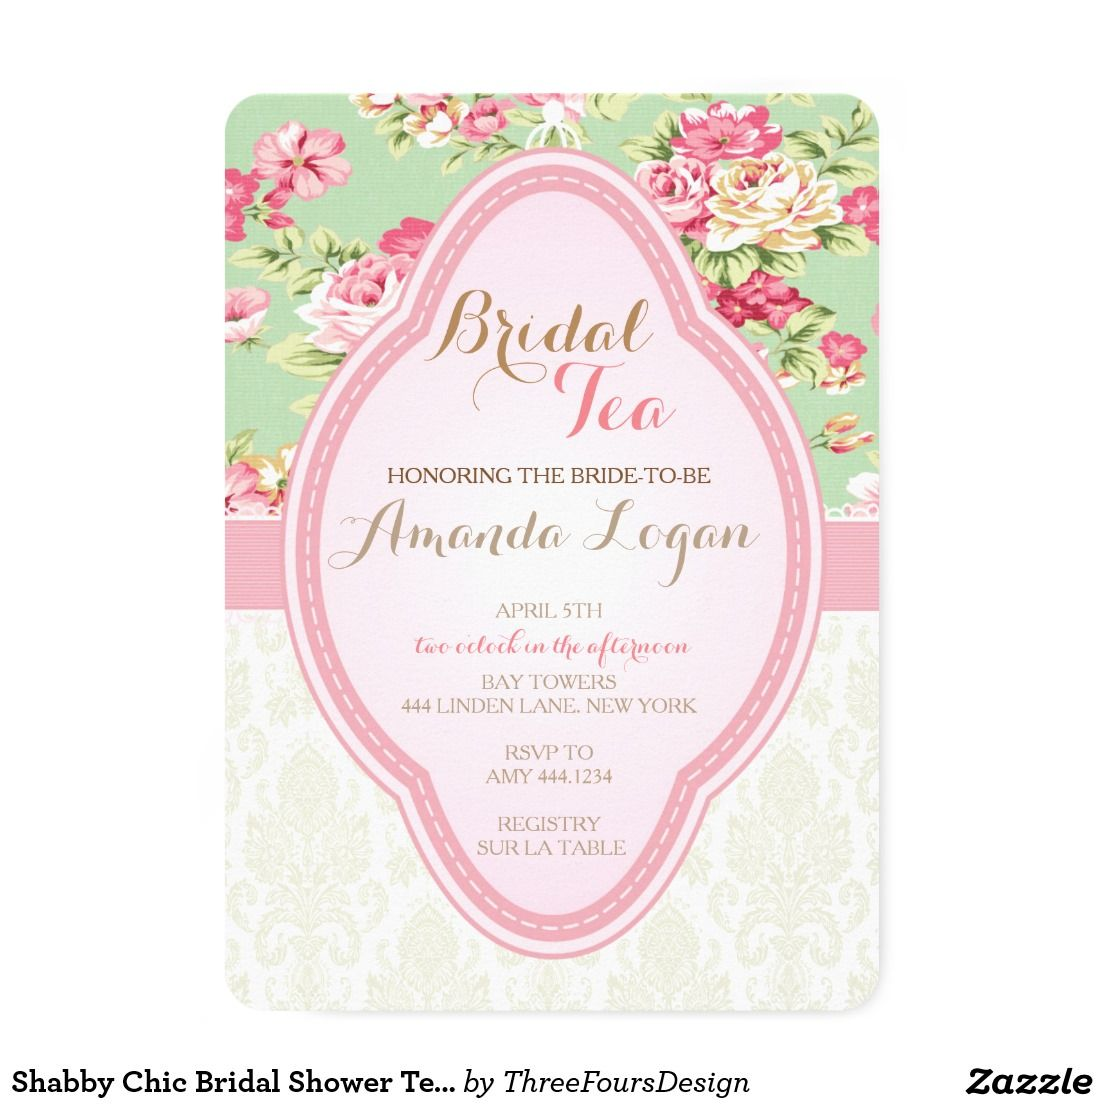 Shabby Chic Bridal Shower Tea Party Invitations | Modern vintage ...